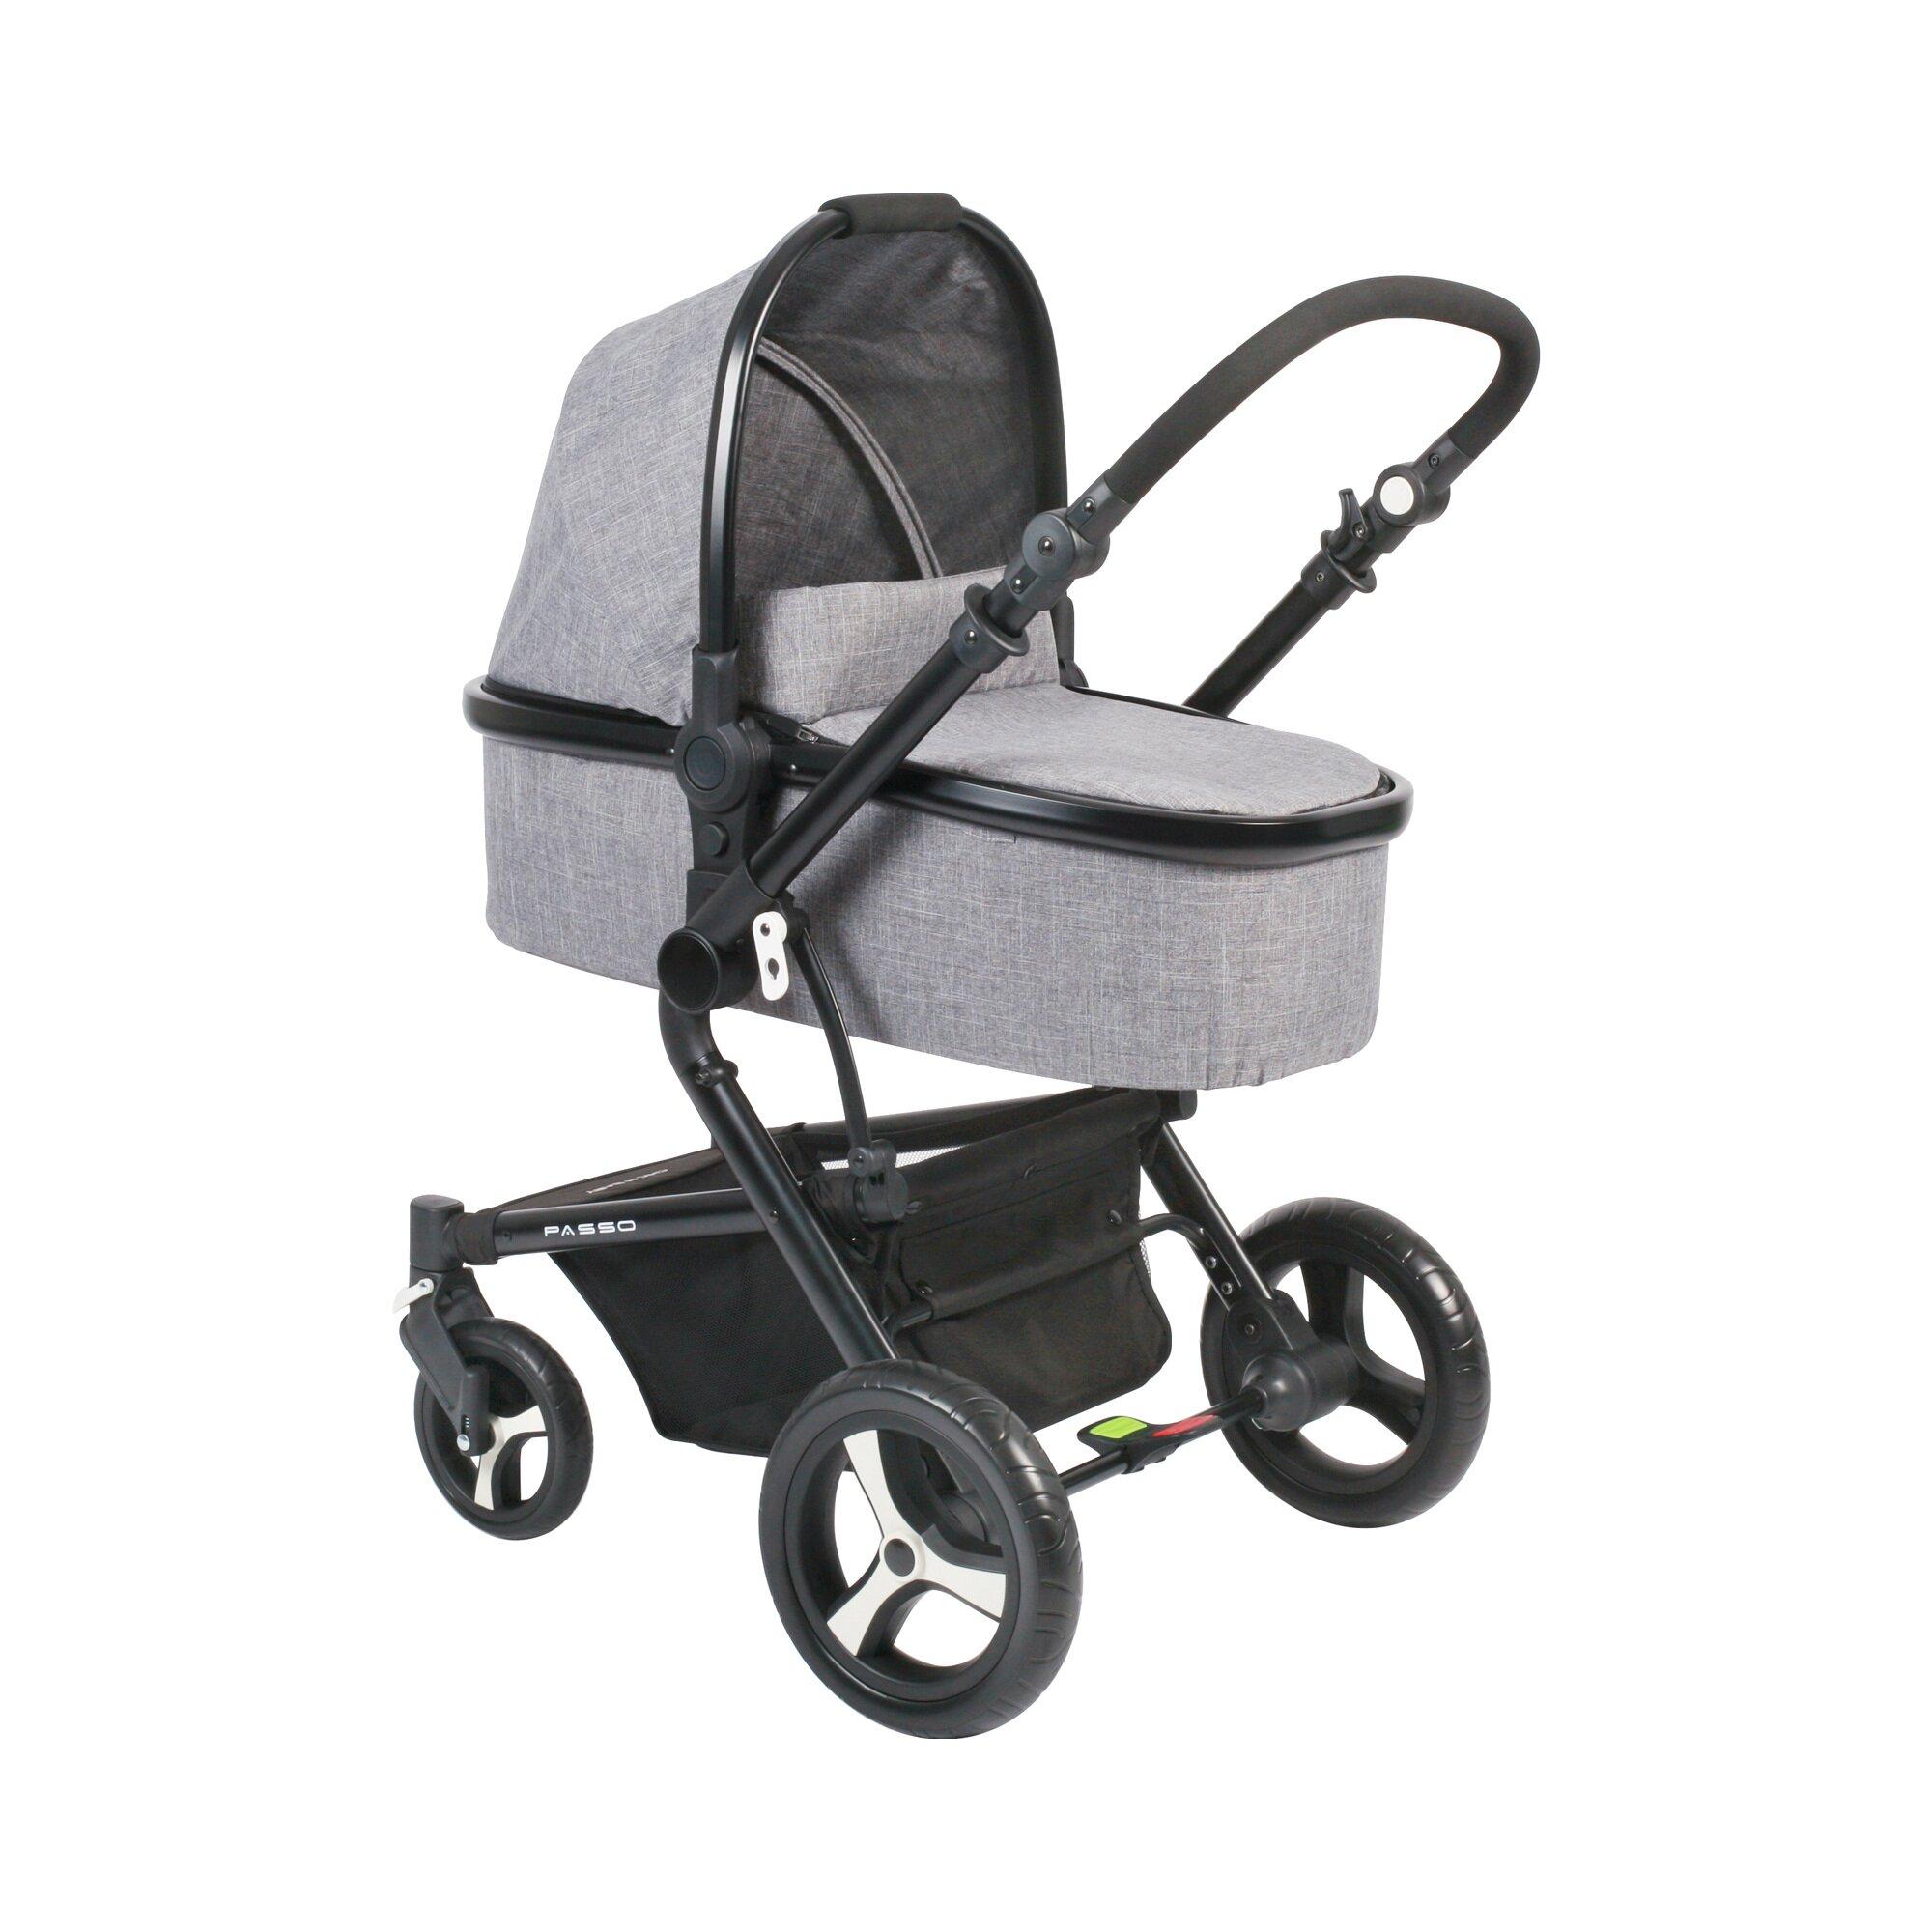 chic-4-baby-passo-kombikinderwagen-design-2018-grau